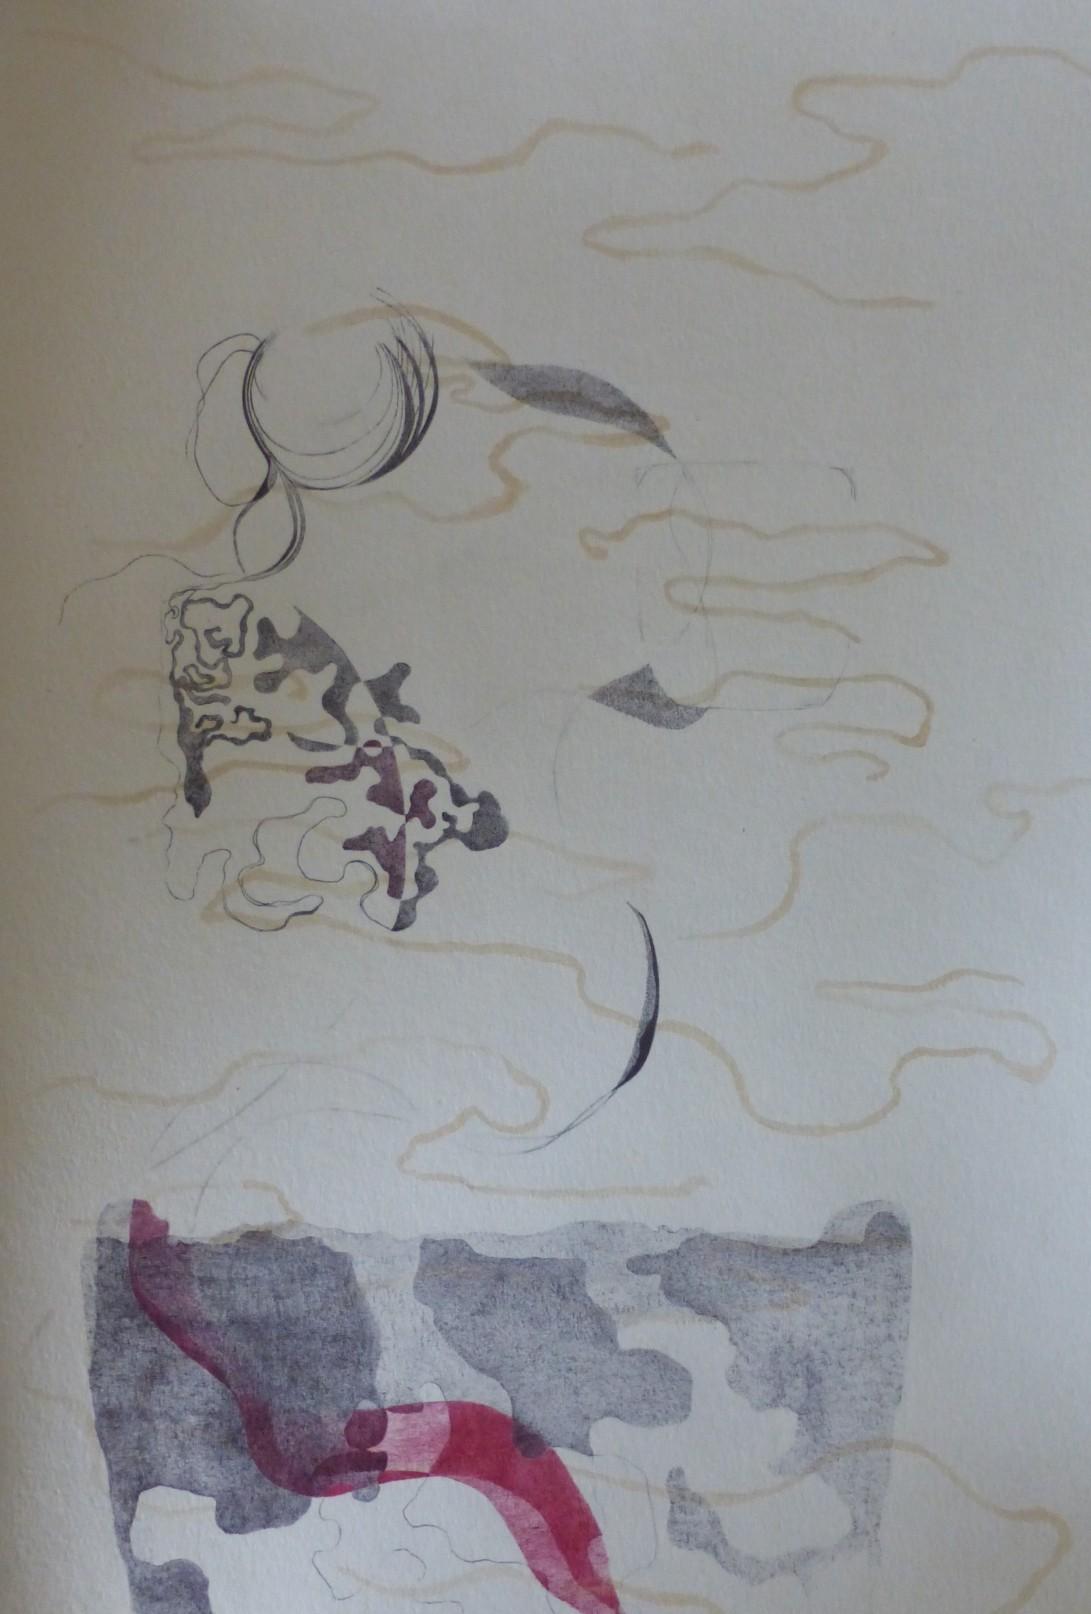 Gaa Wai (dot) com, Fire Balloons, Edit 1, sketch 2